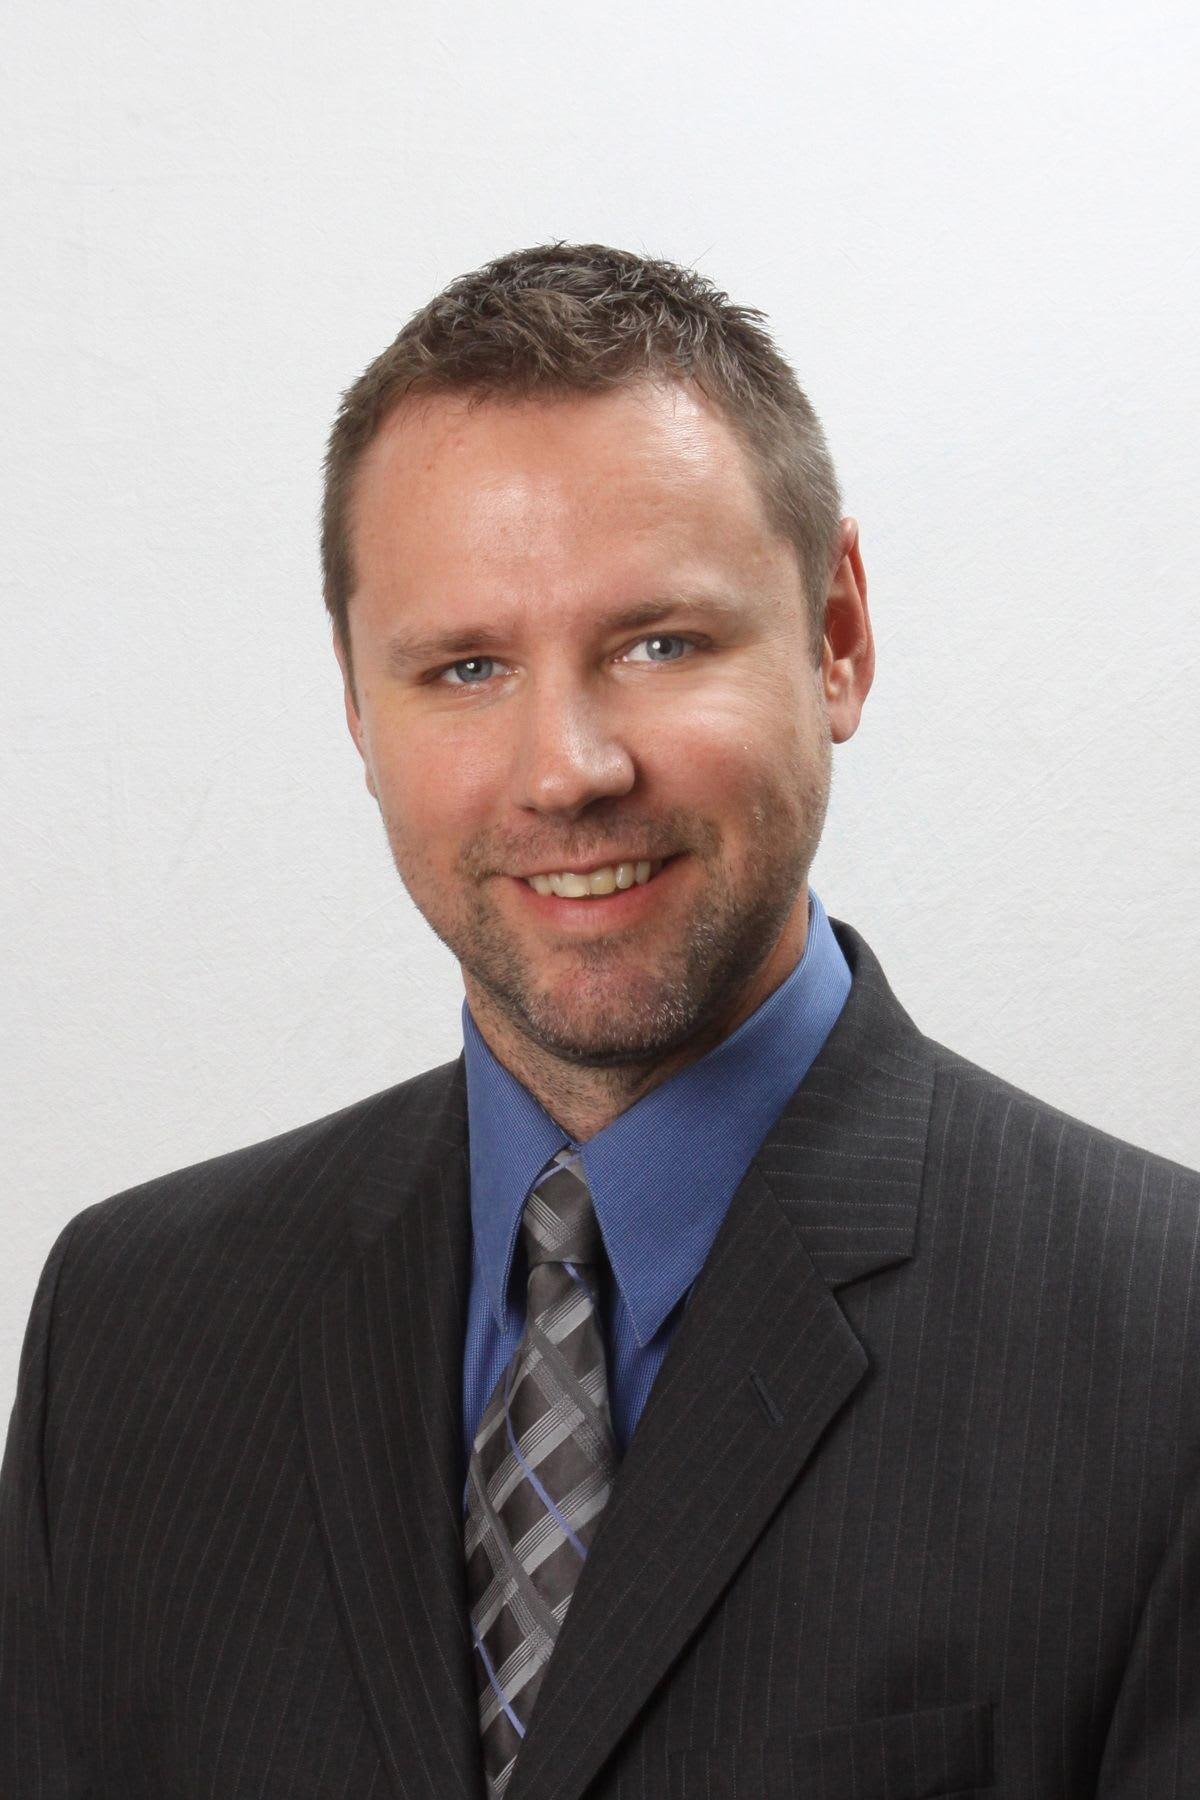 Hans Heiman, Director of Construction & Maintenance Services